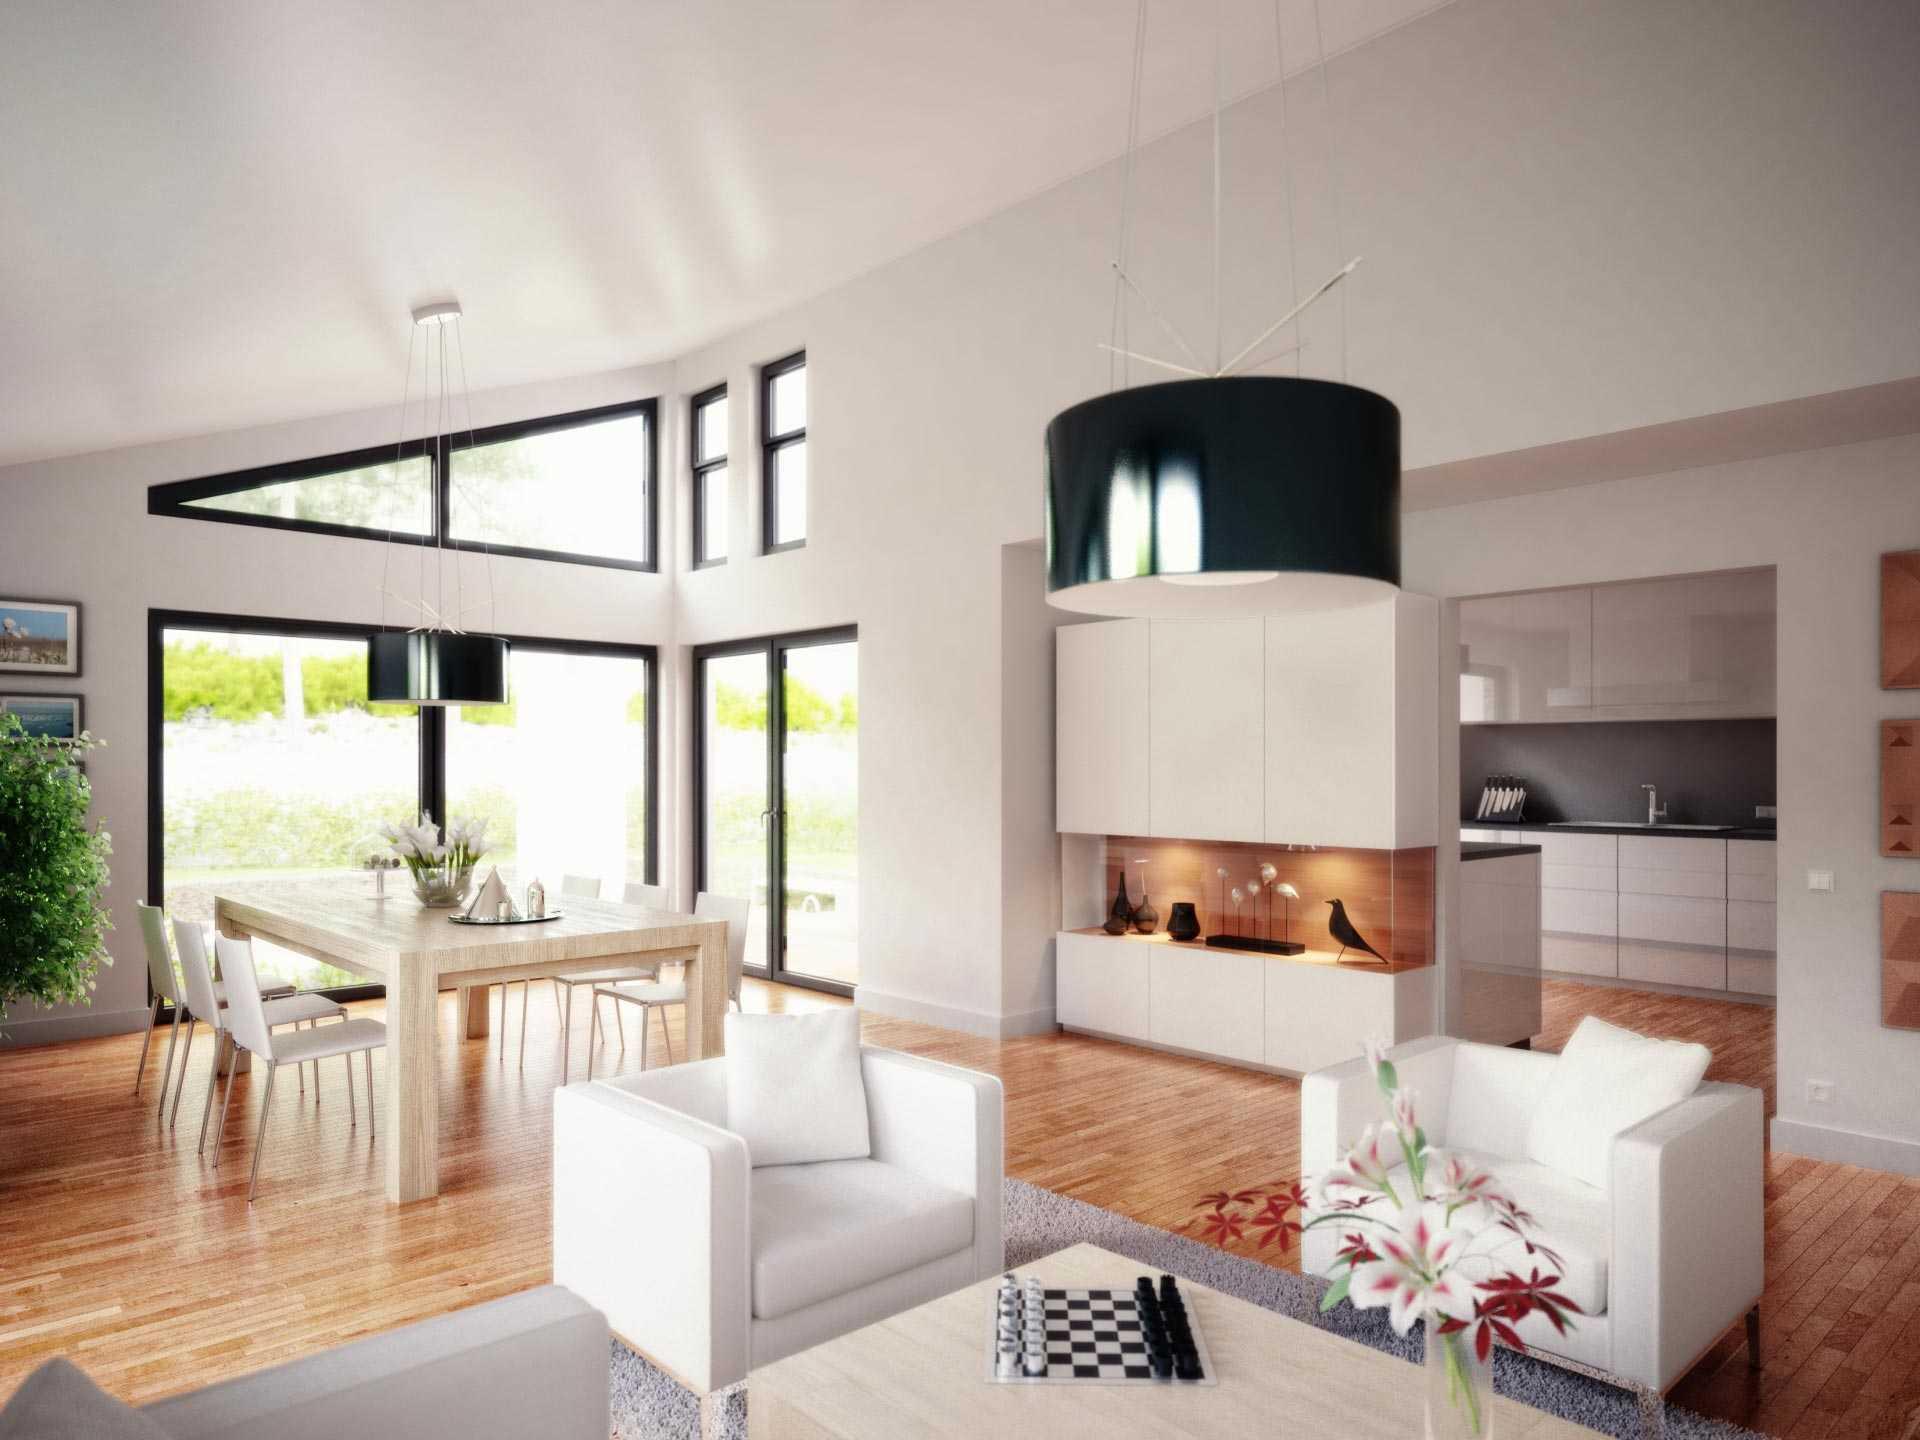 bungalow liberty rensch haus. Black Bedroom Furniture Sets. Home Design Ideas